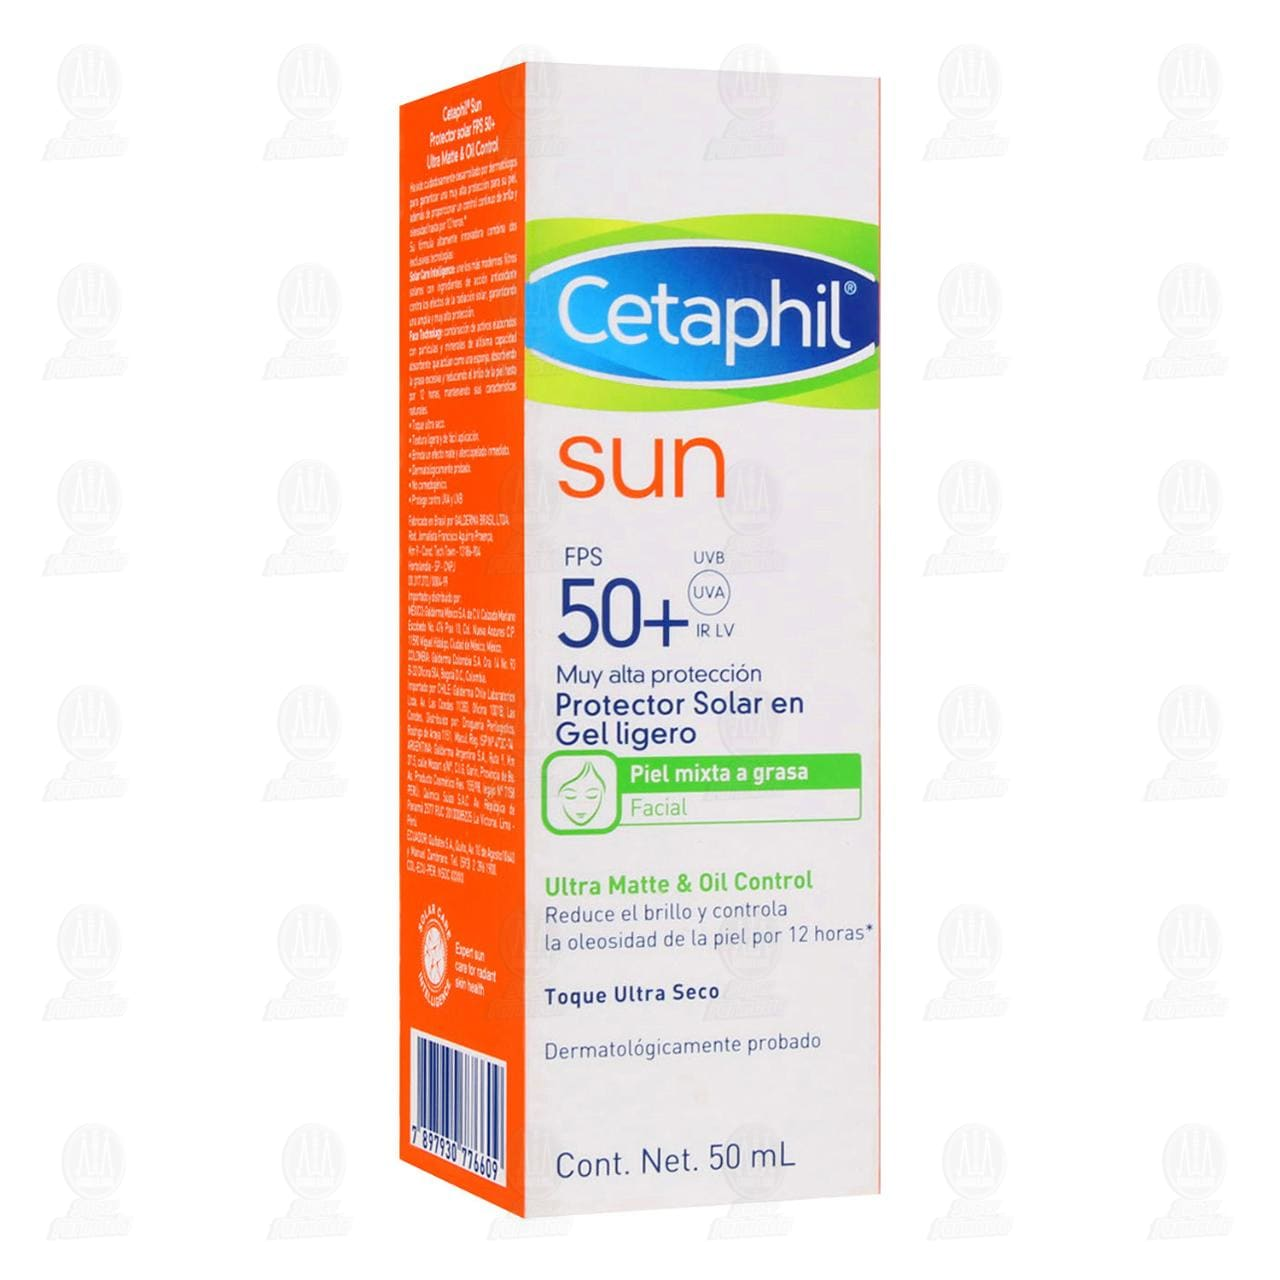 Comprar Cetaphil Sun FPS 50+ Gel Ligero Oil Control, 50 ml. en Farmacias Guadalajara